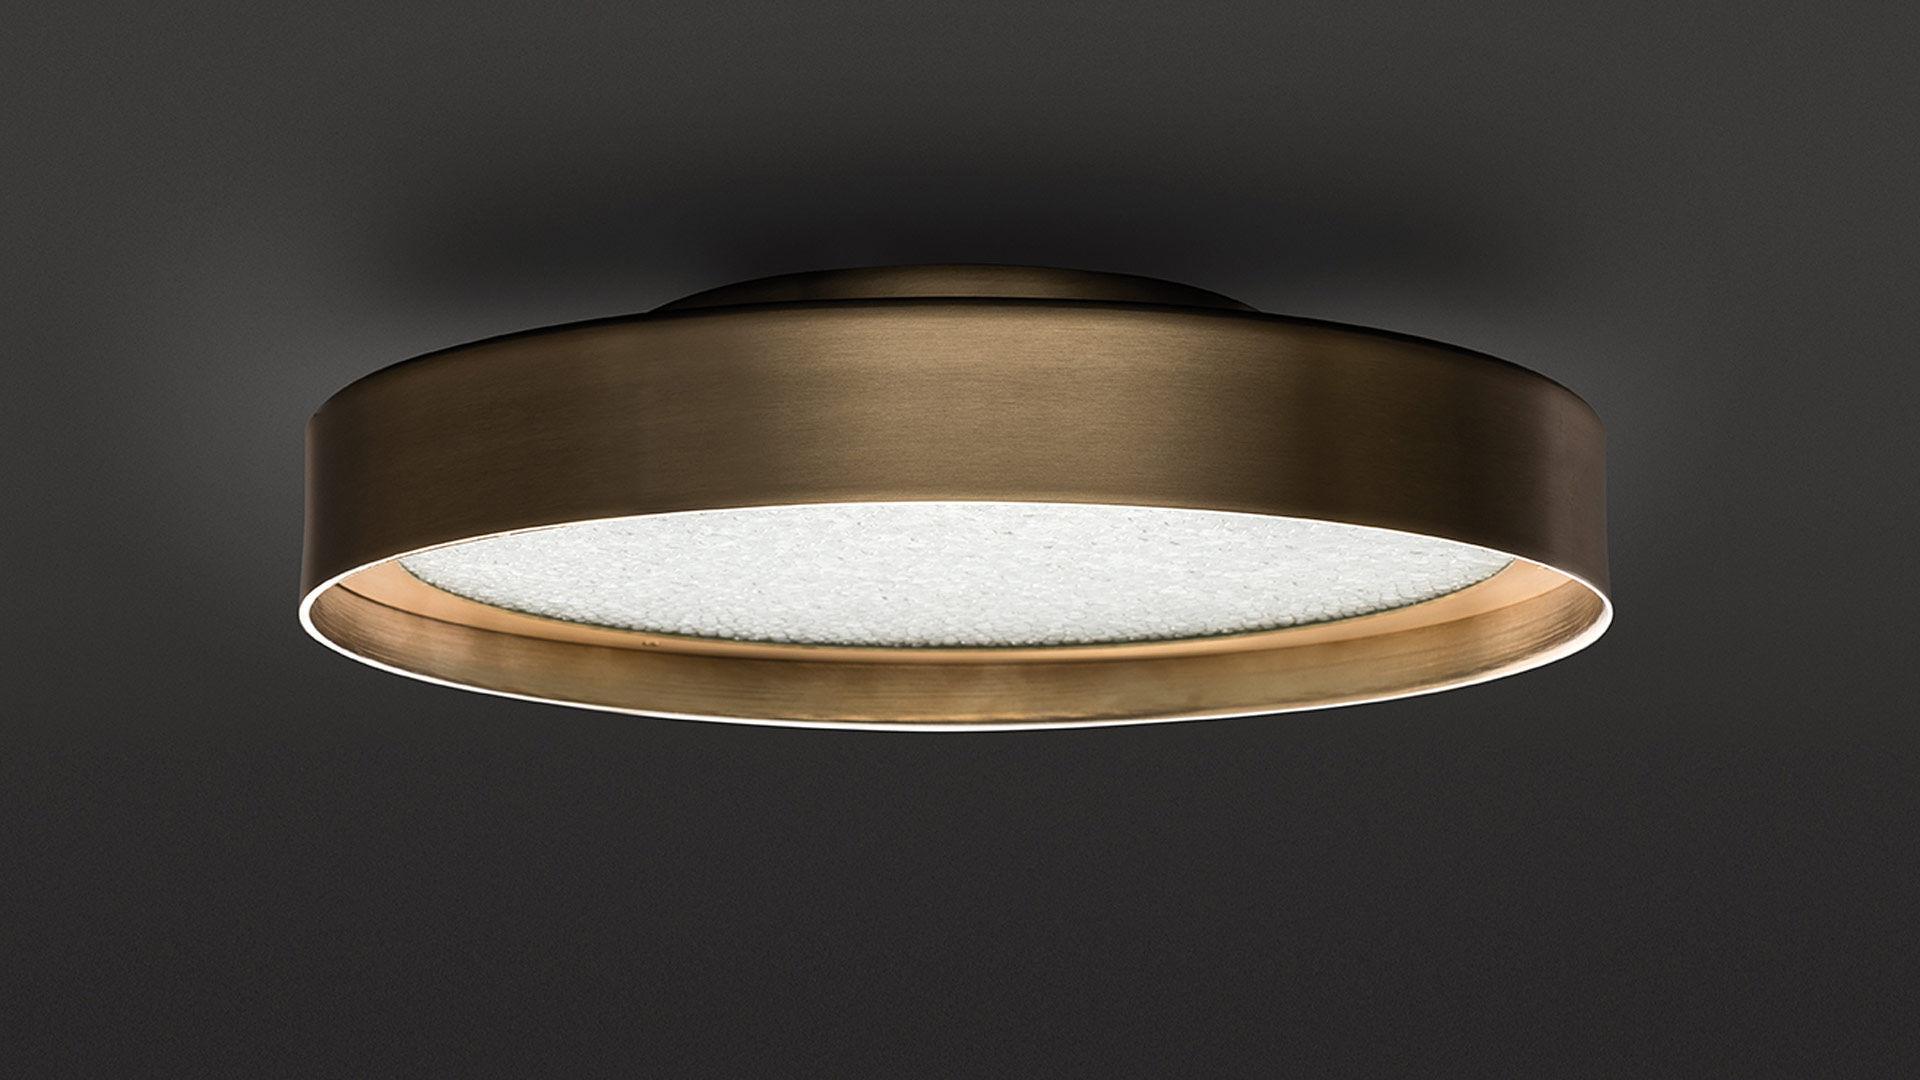 Plafoniera Fiori Vetro : Plafoniera moderna tonda in vetro metallo berlin oluce